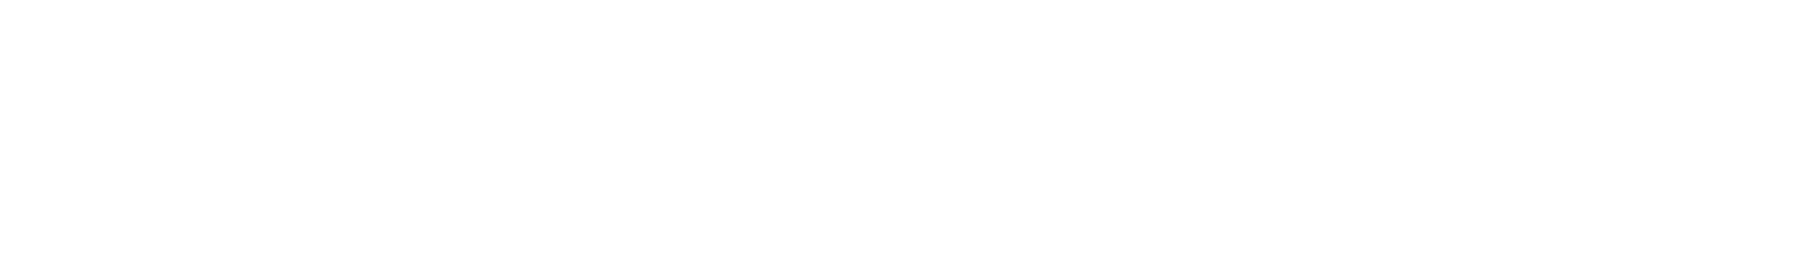 16438 cutbassloop1 wav